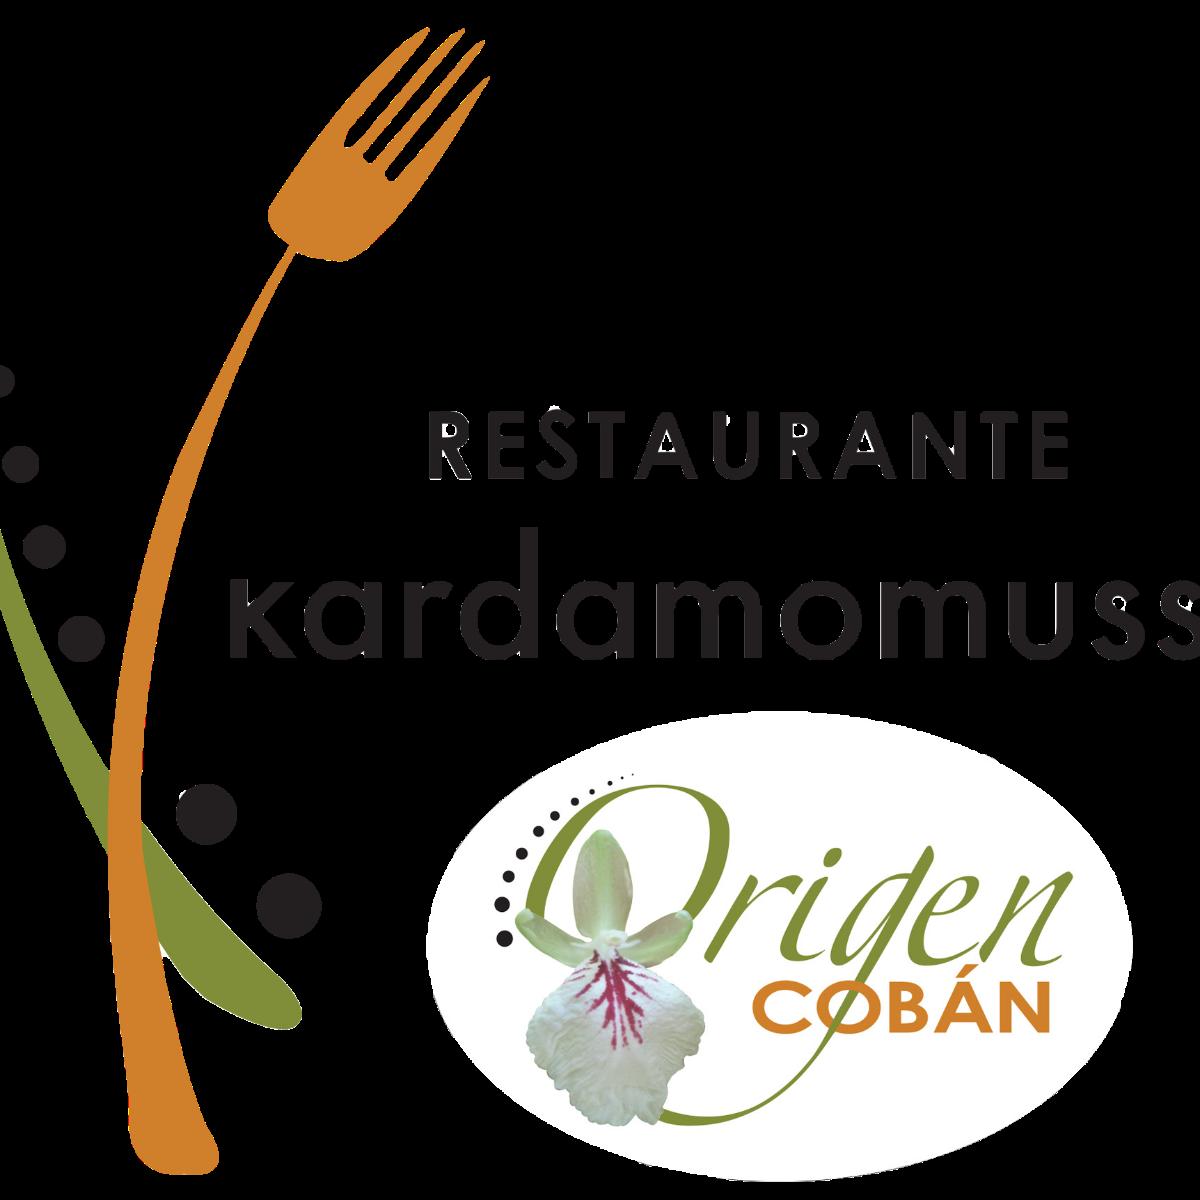 logo_Restaurante Kardamomus